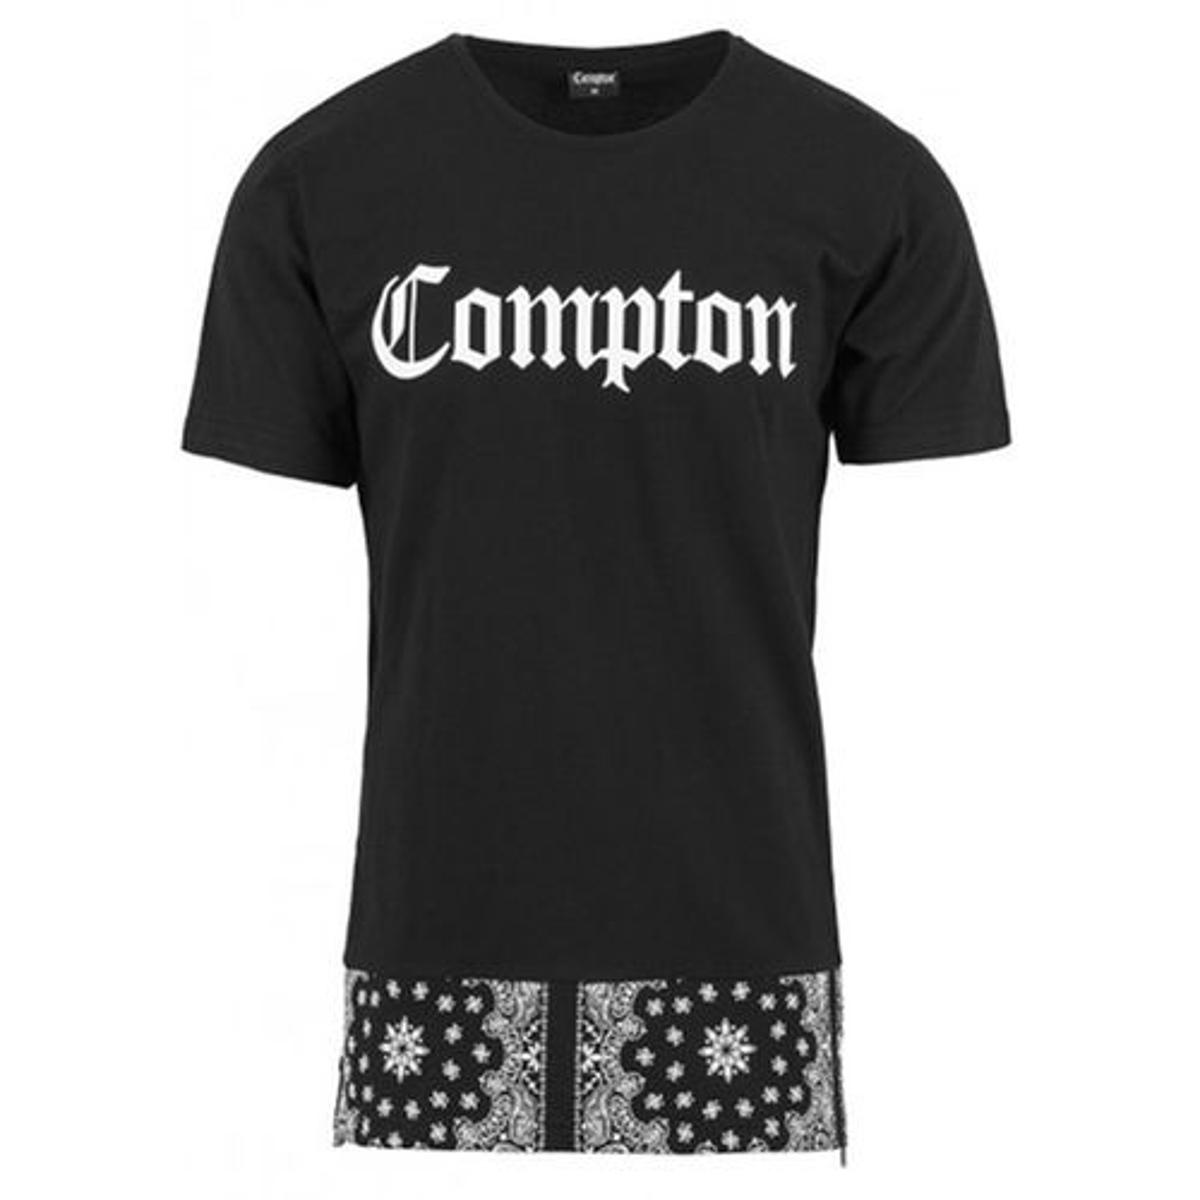 T-shirt Long Compton Bandana x Mister Tee Noir NWA